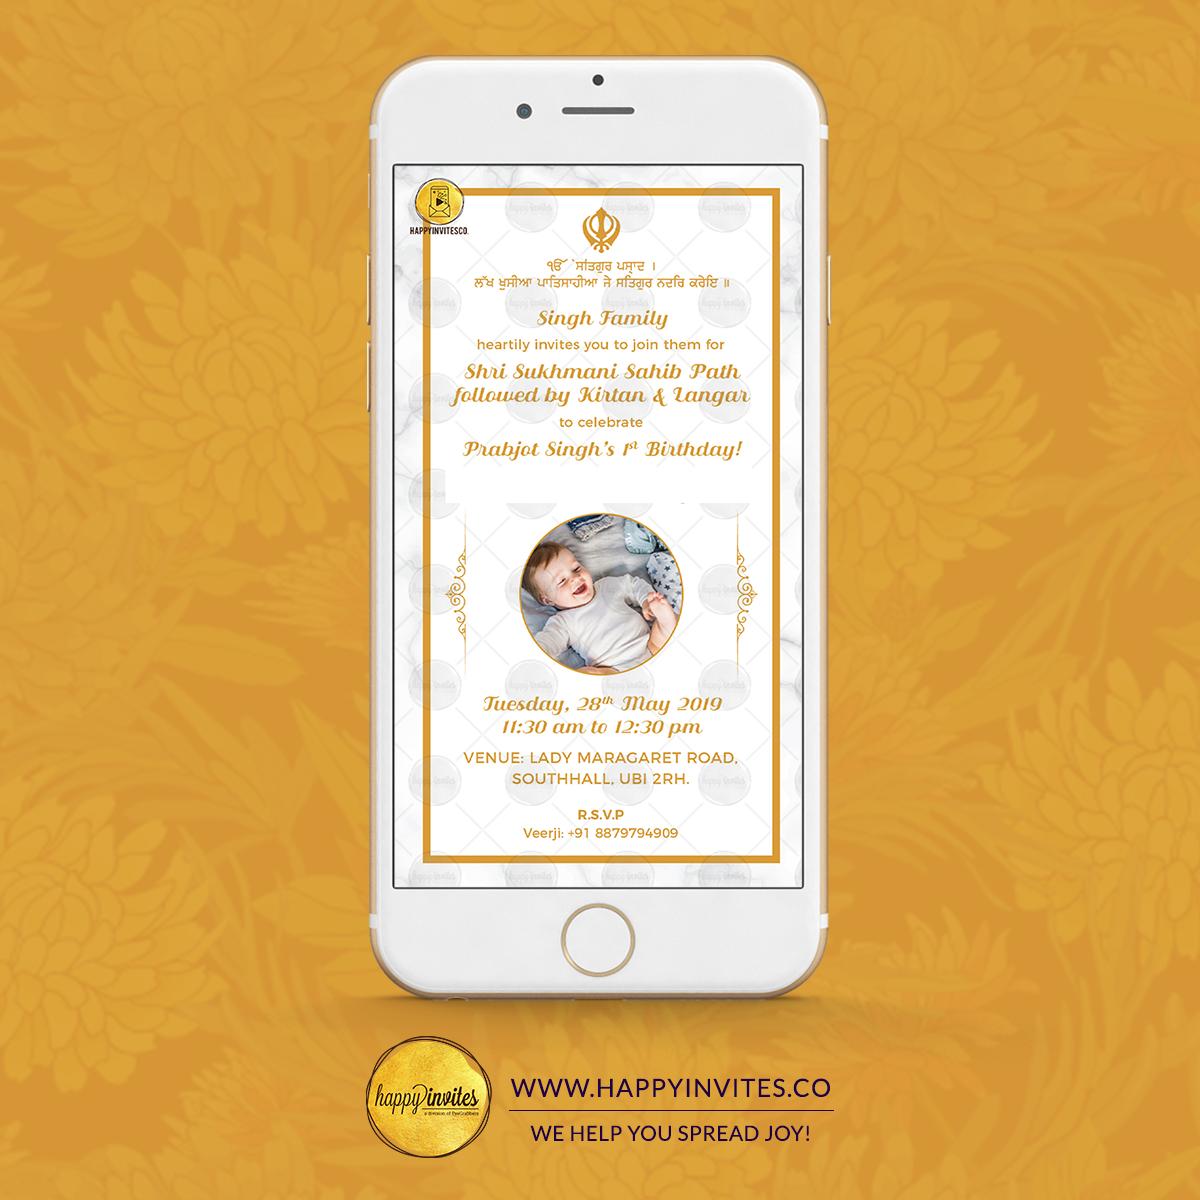 Sukhmani Sahib Path Invitation Online Whastapp Card Happy Invites 1st Birthday Invitations Online Invitations Invitation Cards